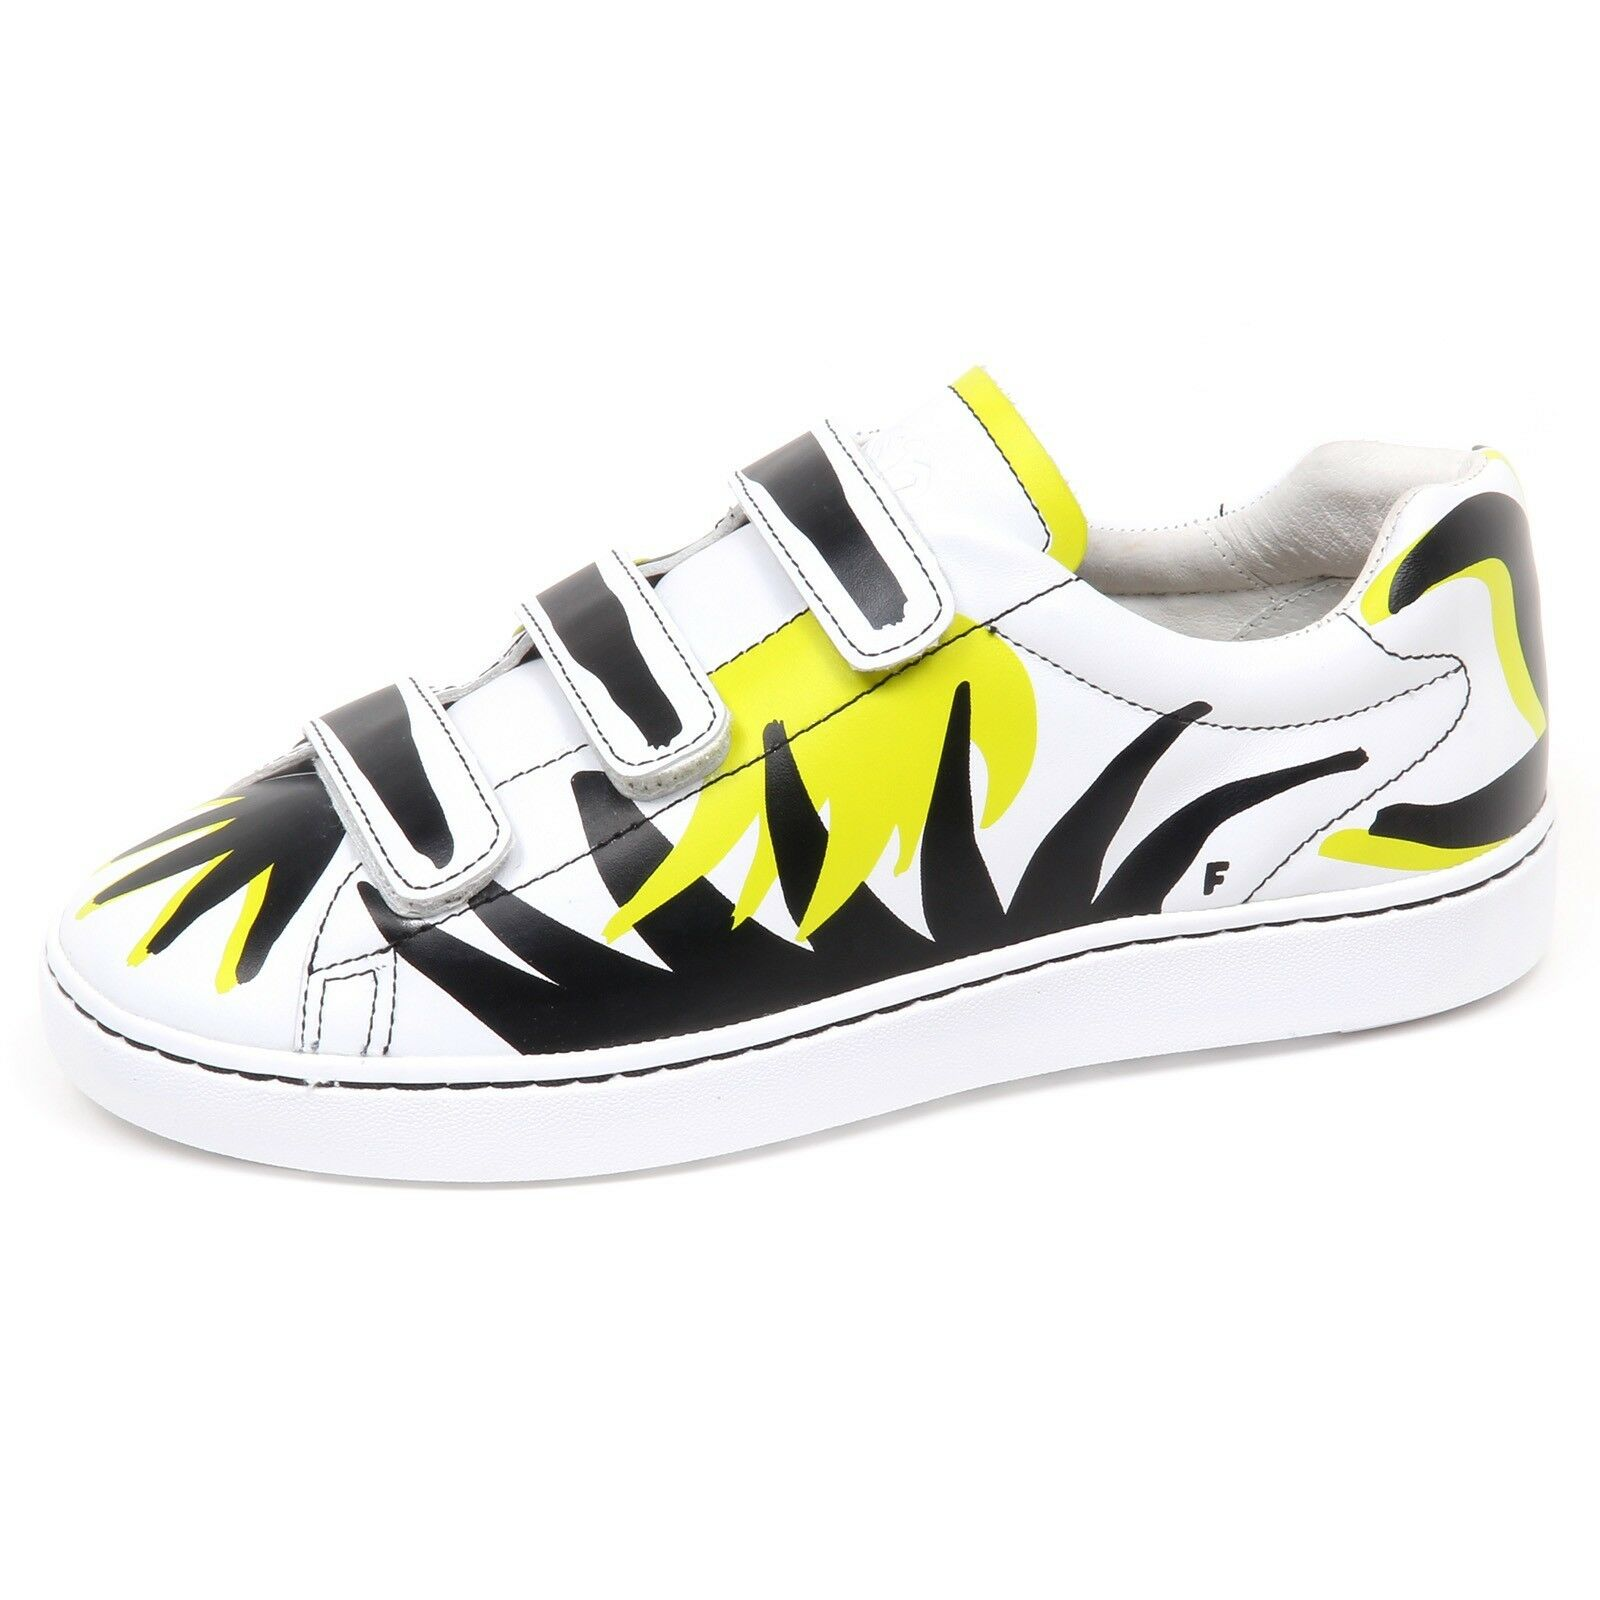 E8756 tenis mujer ceniza X Filip pagowski pagowski pagowski Pharell Flame zapatos strappi Zapato Mujer  preferente